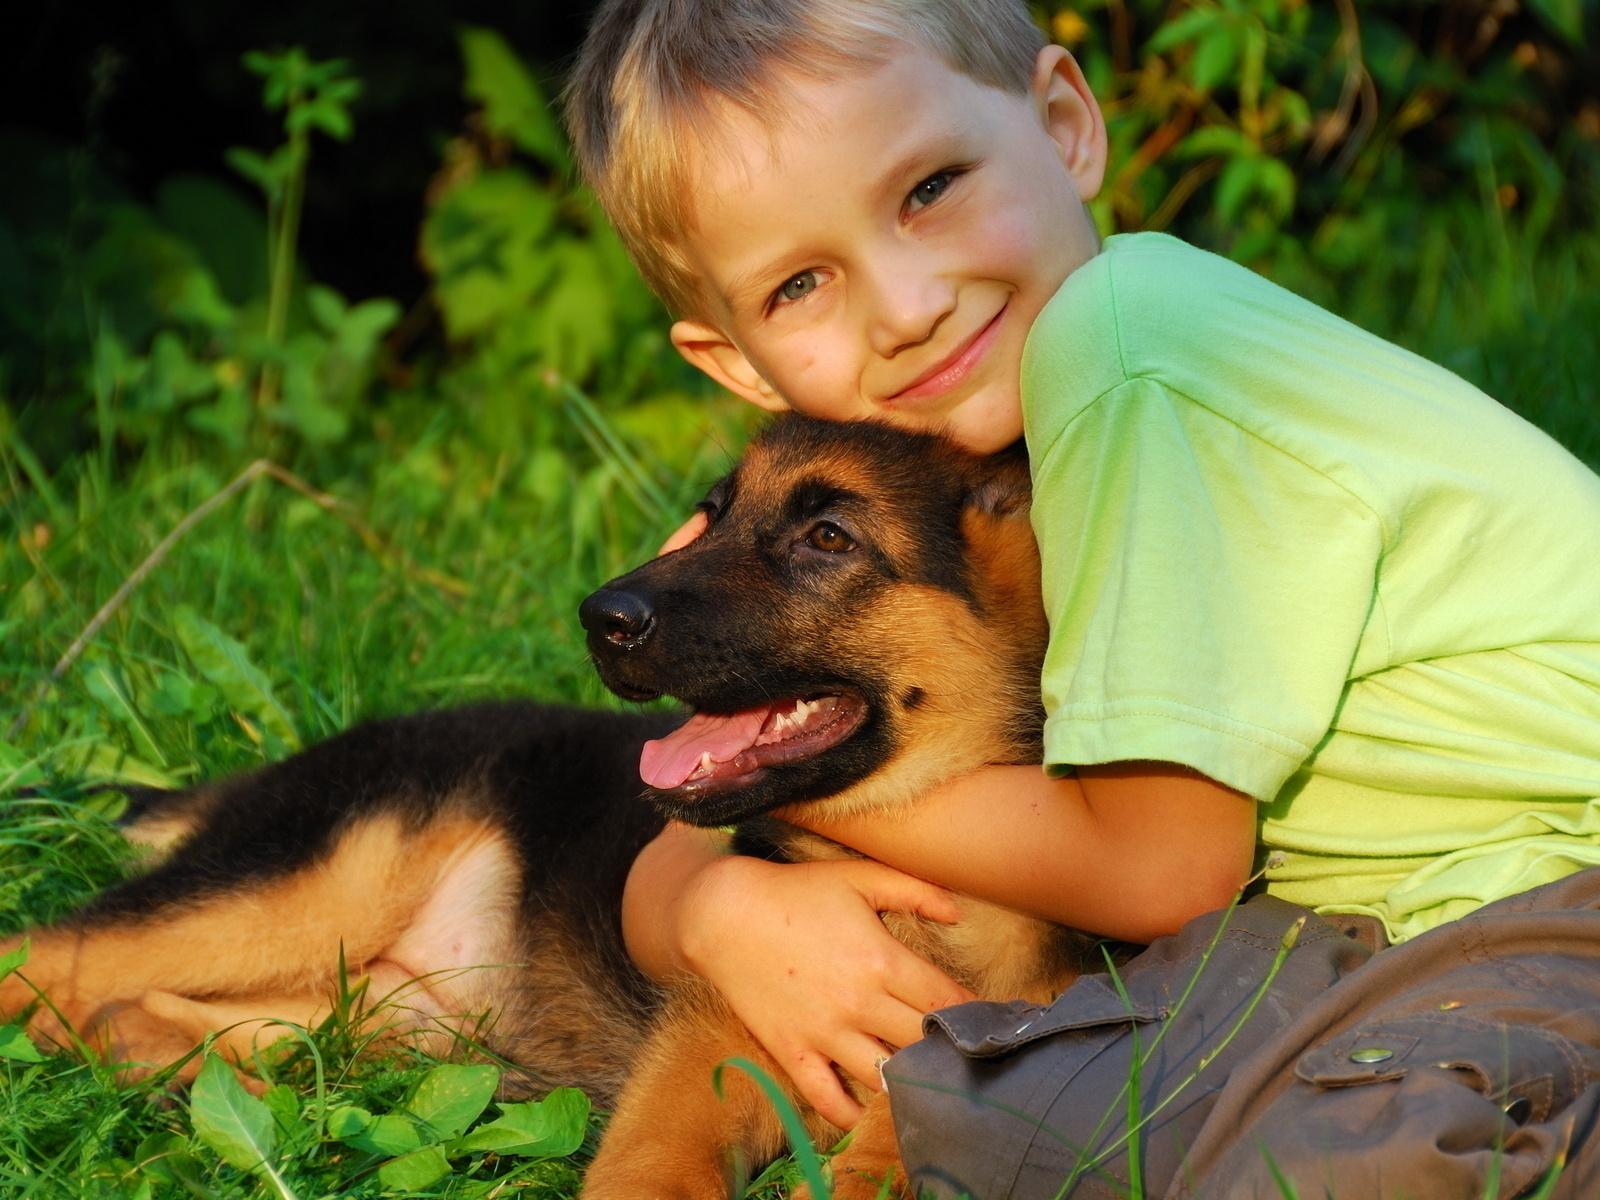 fotos-de-niño-abrazando-al-perrro_www.fotospix.com_